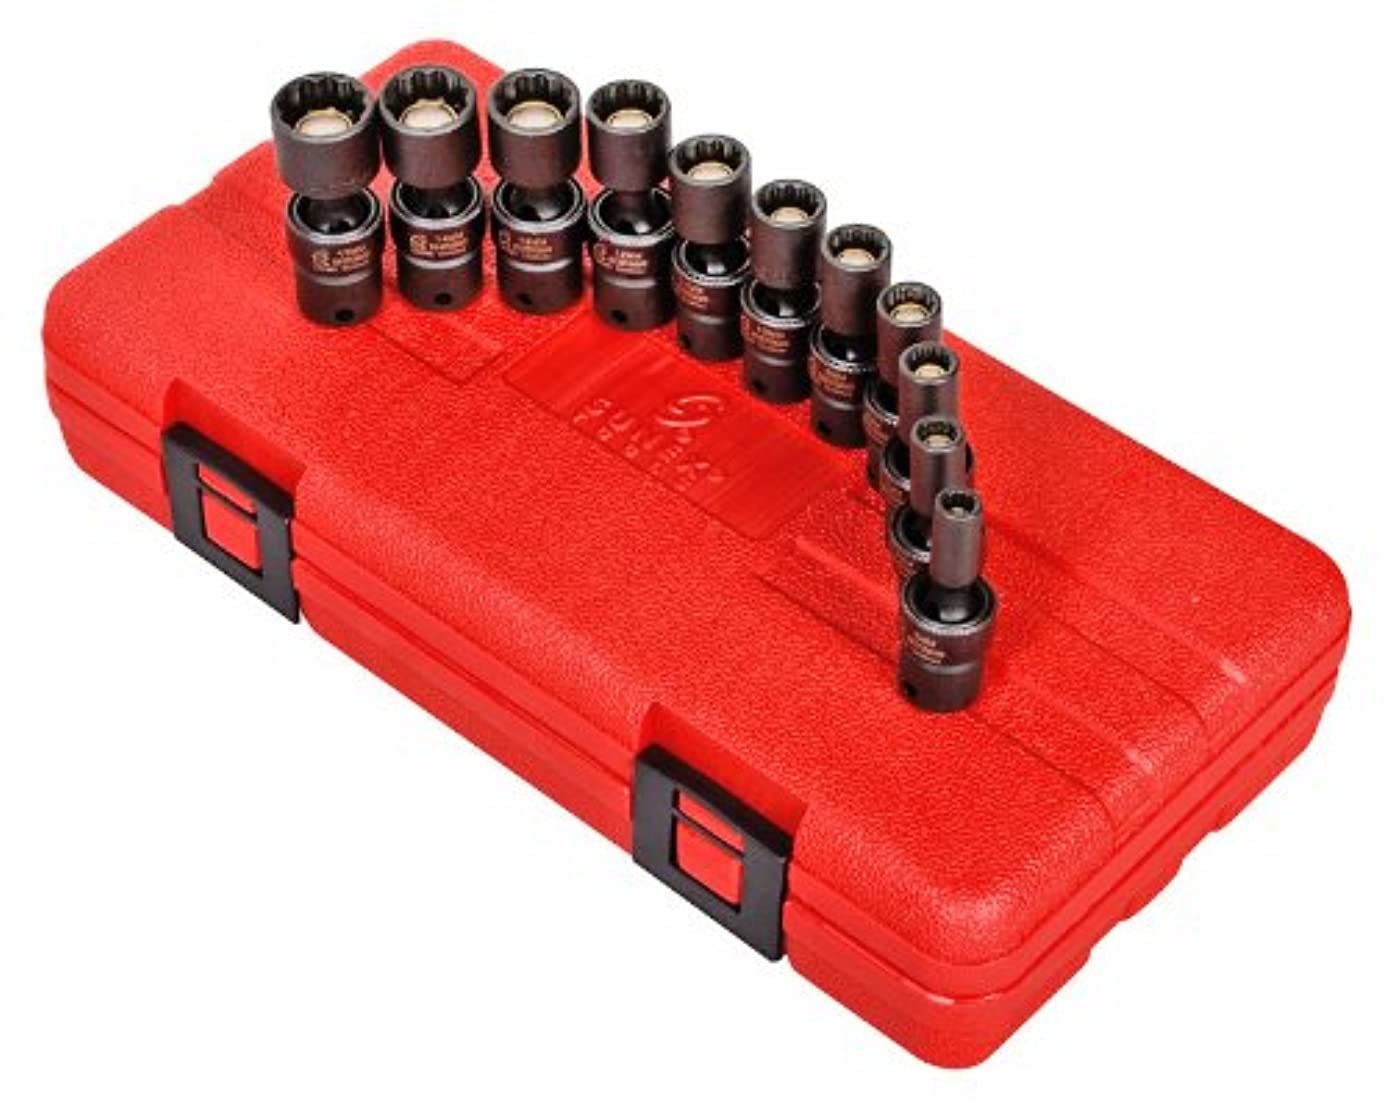 Sunex 1825 1/4-Inch Drive Universal Magnetic Impact Socket Set, Metric, 12-Point, Cr-Mo, 5mm - 15mm, 11-Piece